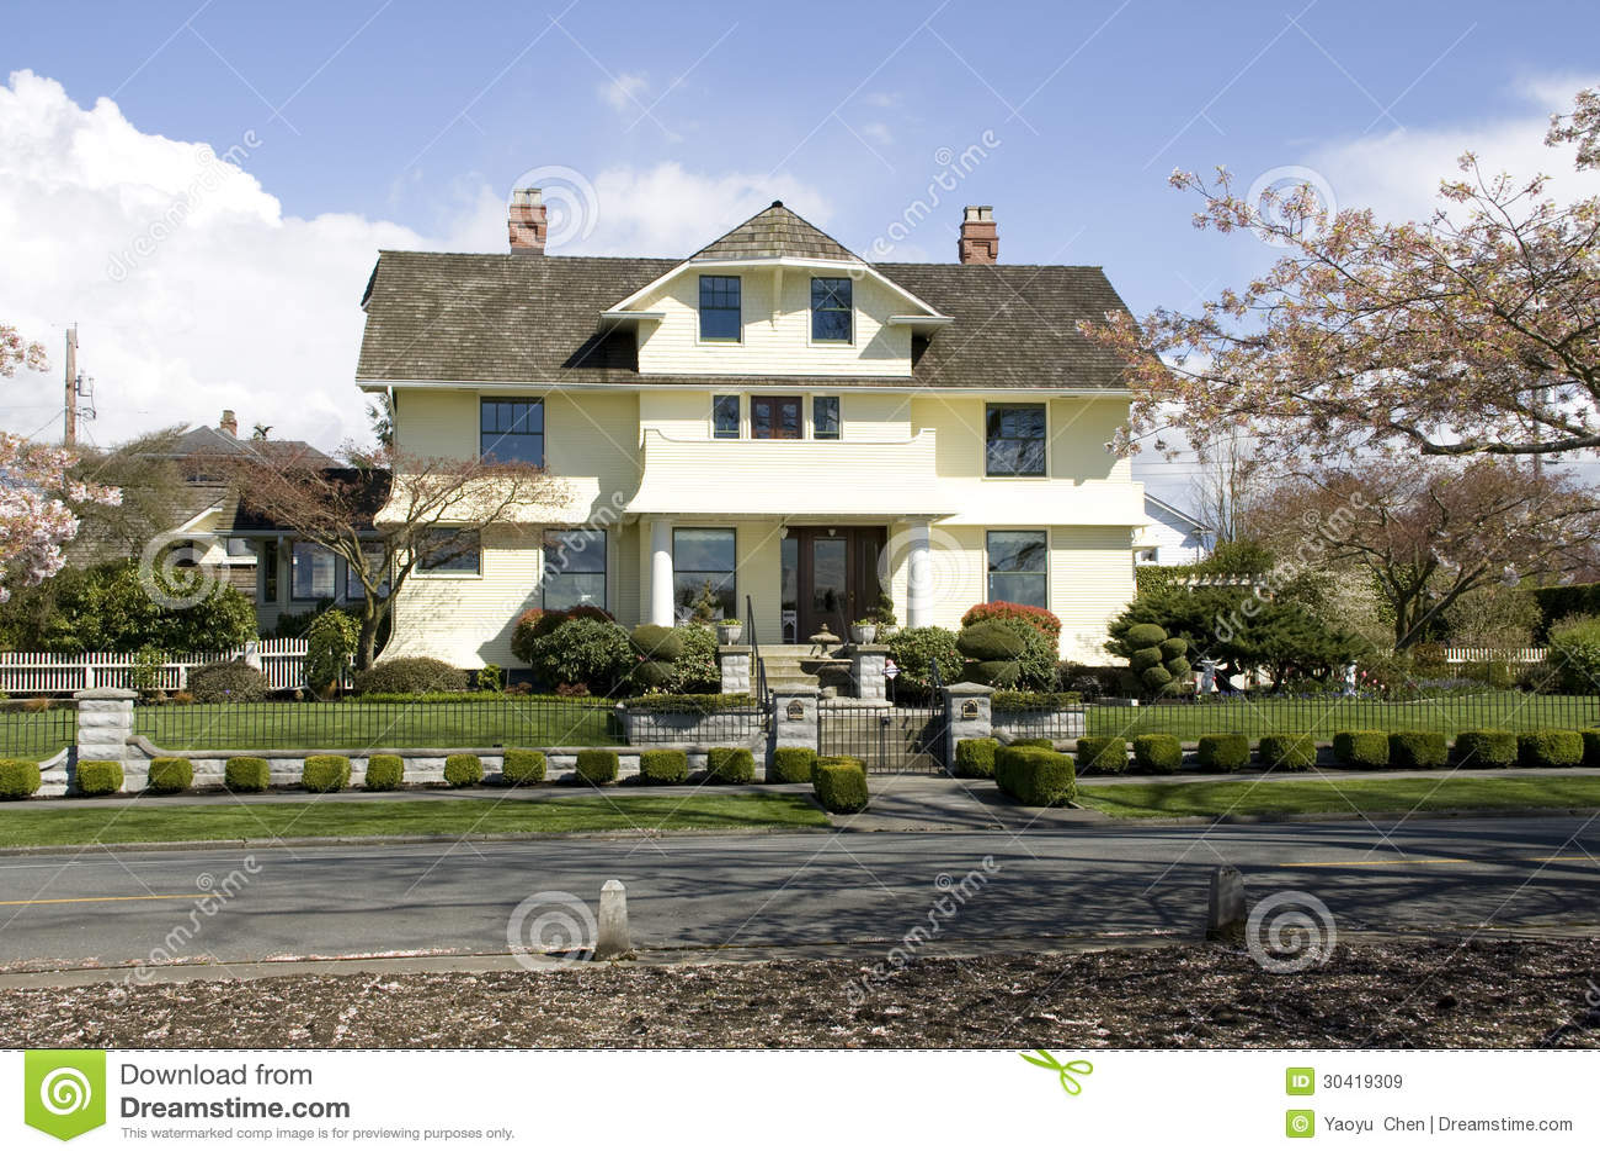 Mooi huis met traditinalontwerpen